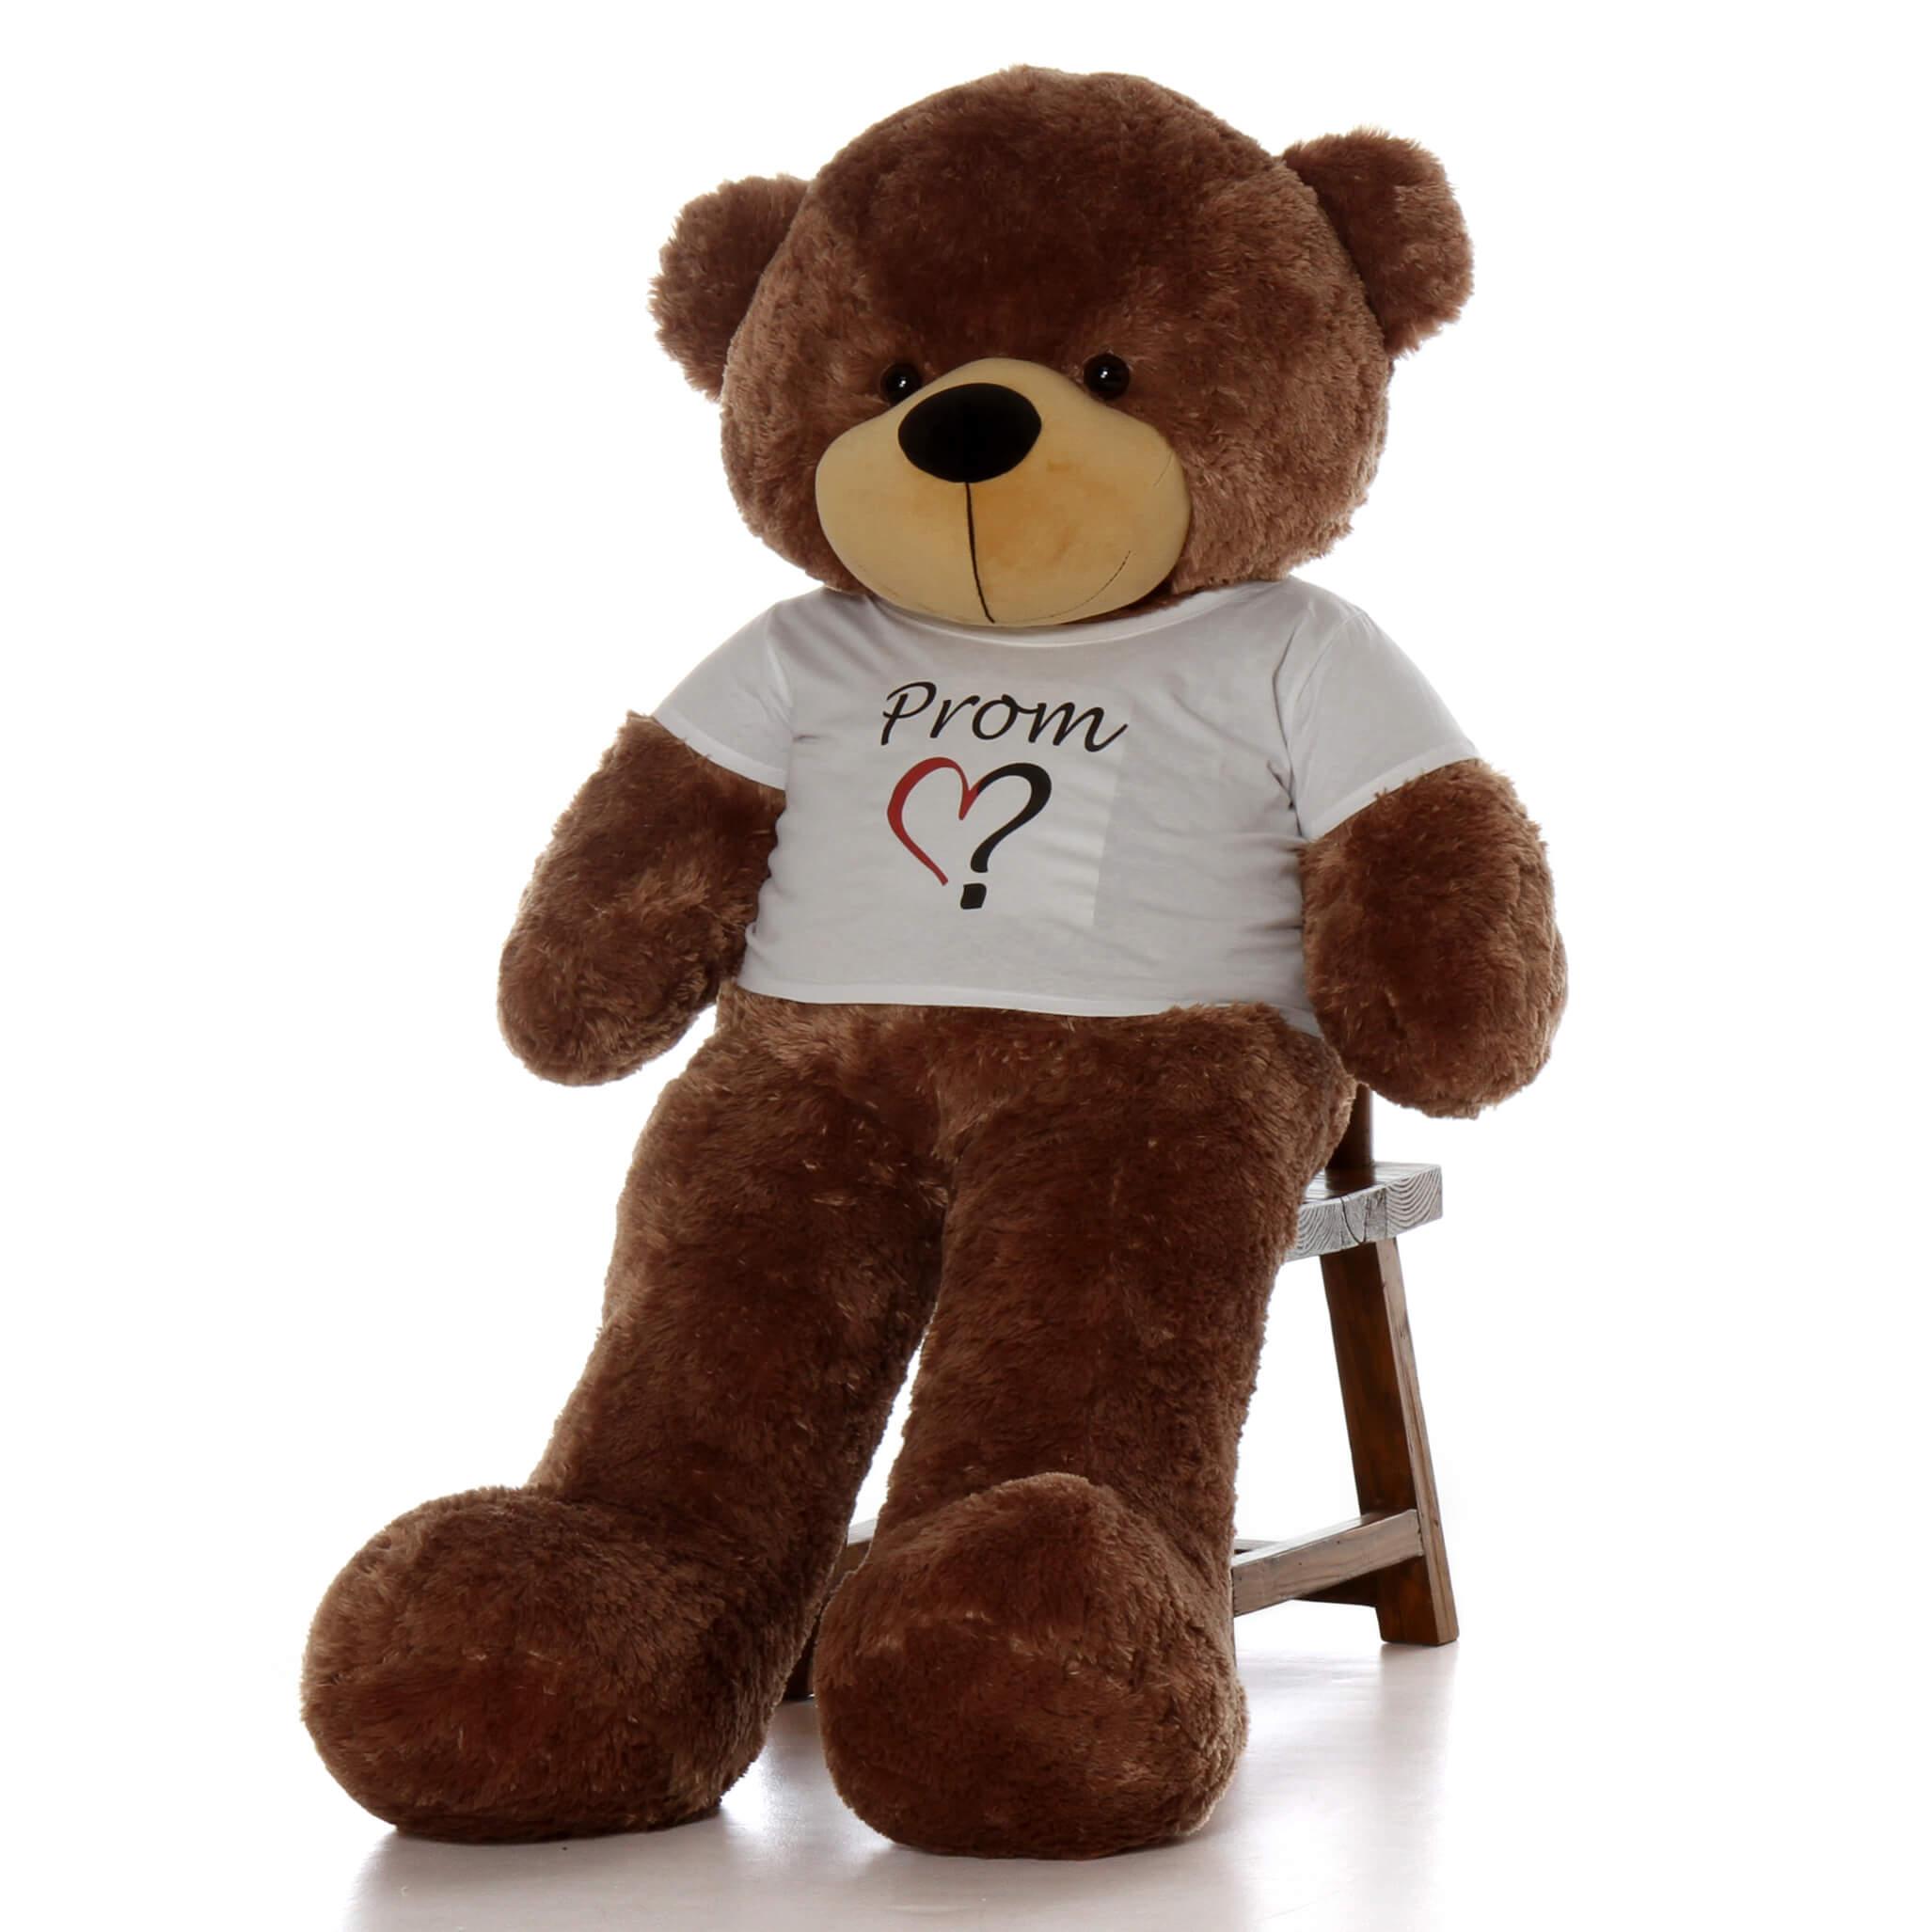 5ft-mocha-brown-teddy-bear-sunny-cuddles-in-a-heart-prom-shirt-1.jpg